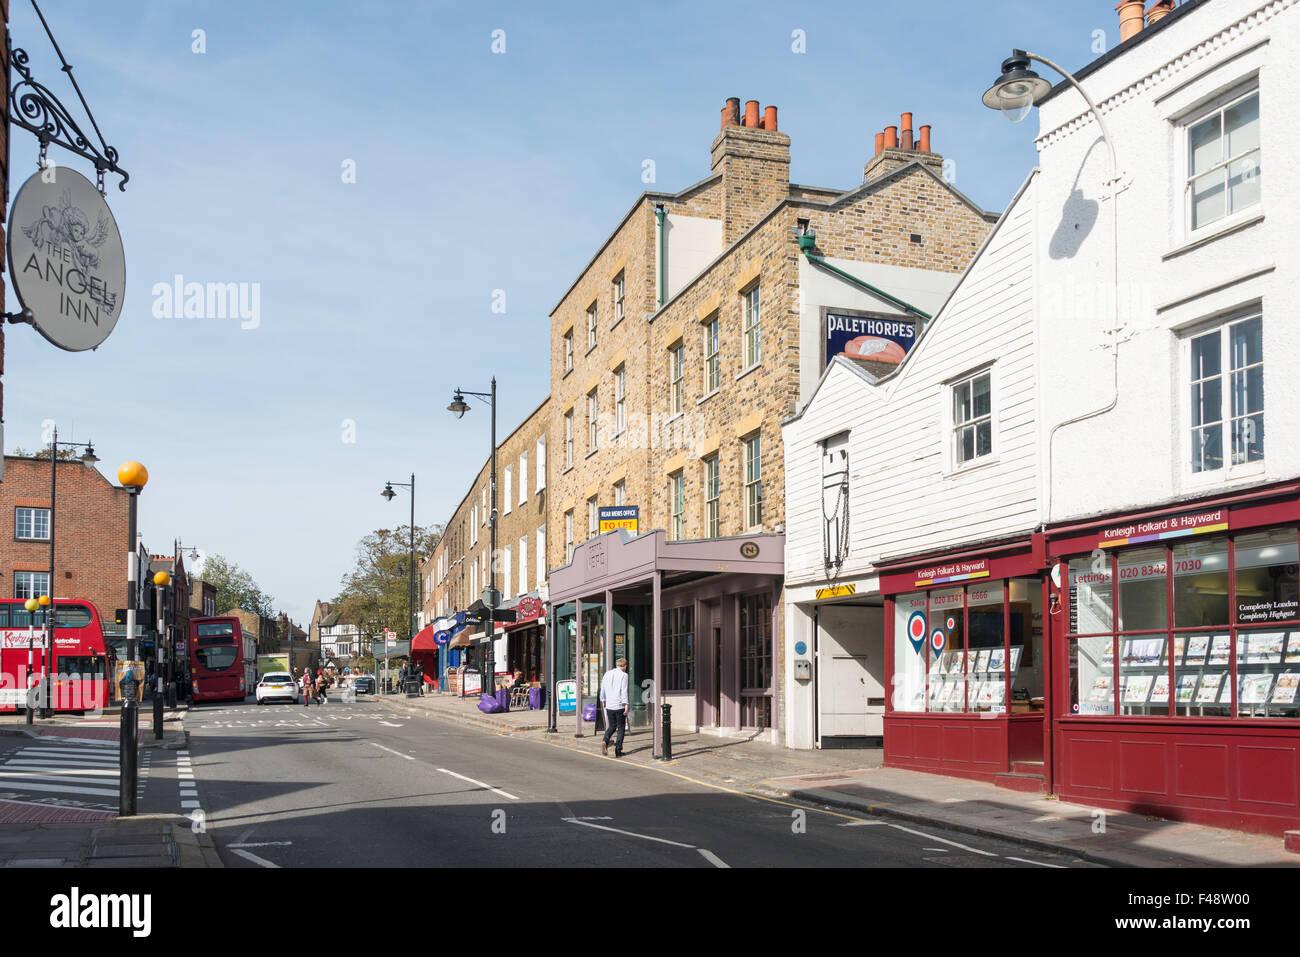 Highgate High Street, Highgate, London Borough of Haringey, Greater London, England, United Kingdom Stock Photo